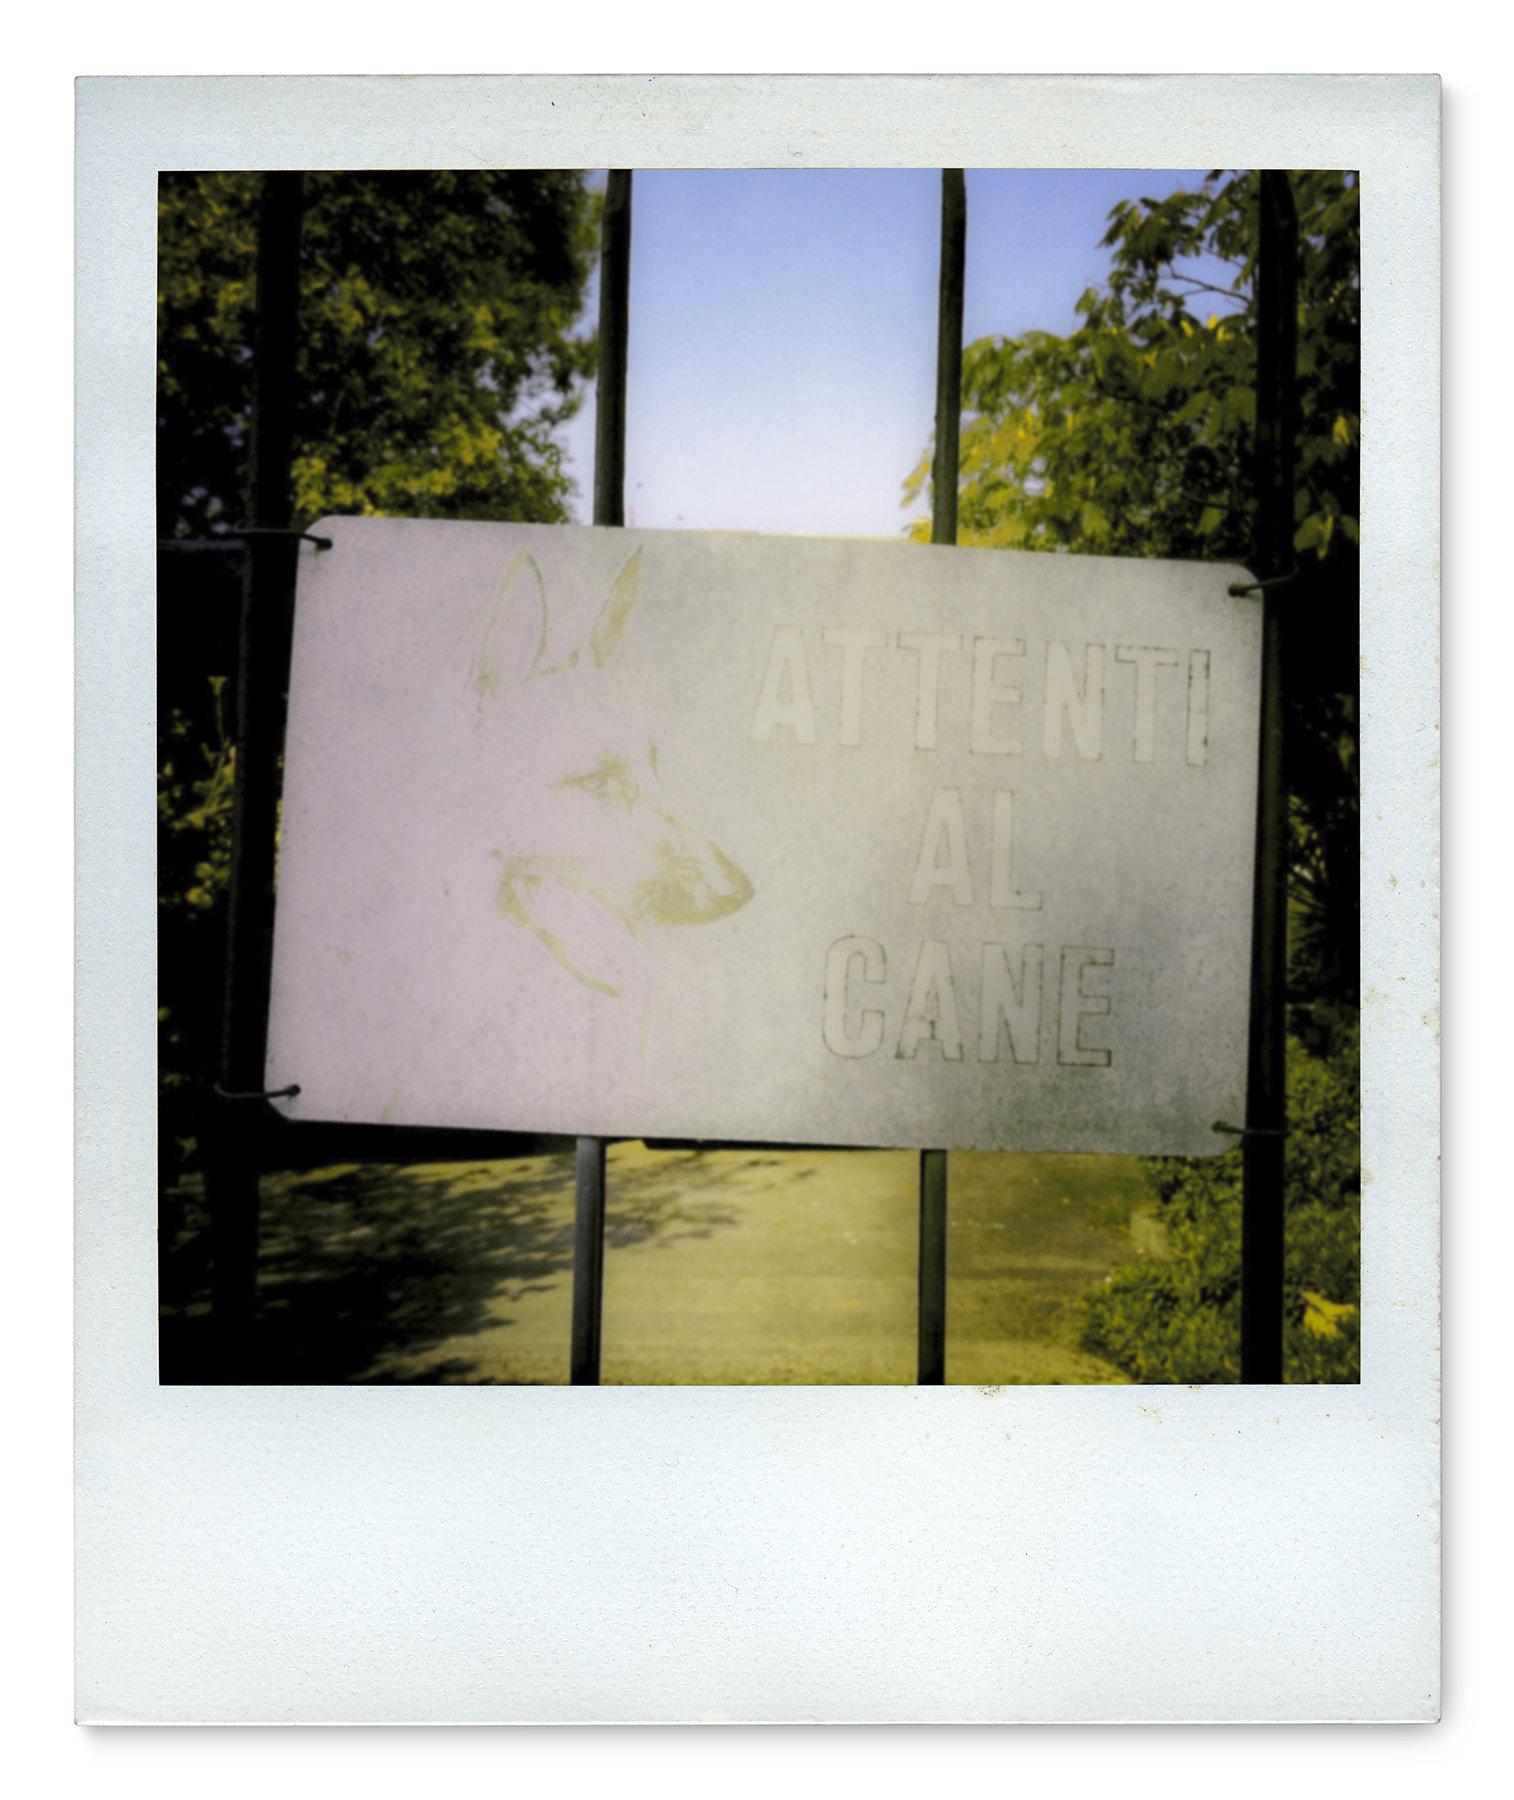 003_Polaroid SX70_IMG_2477.jpg